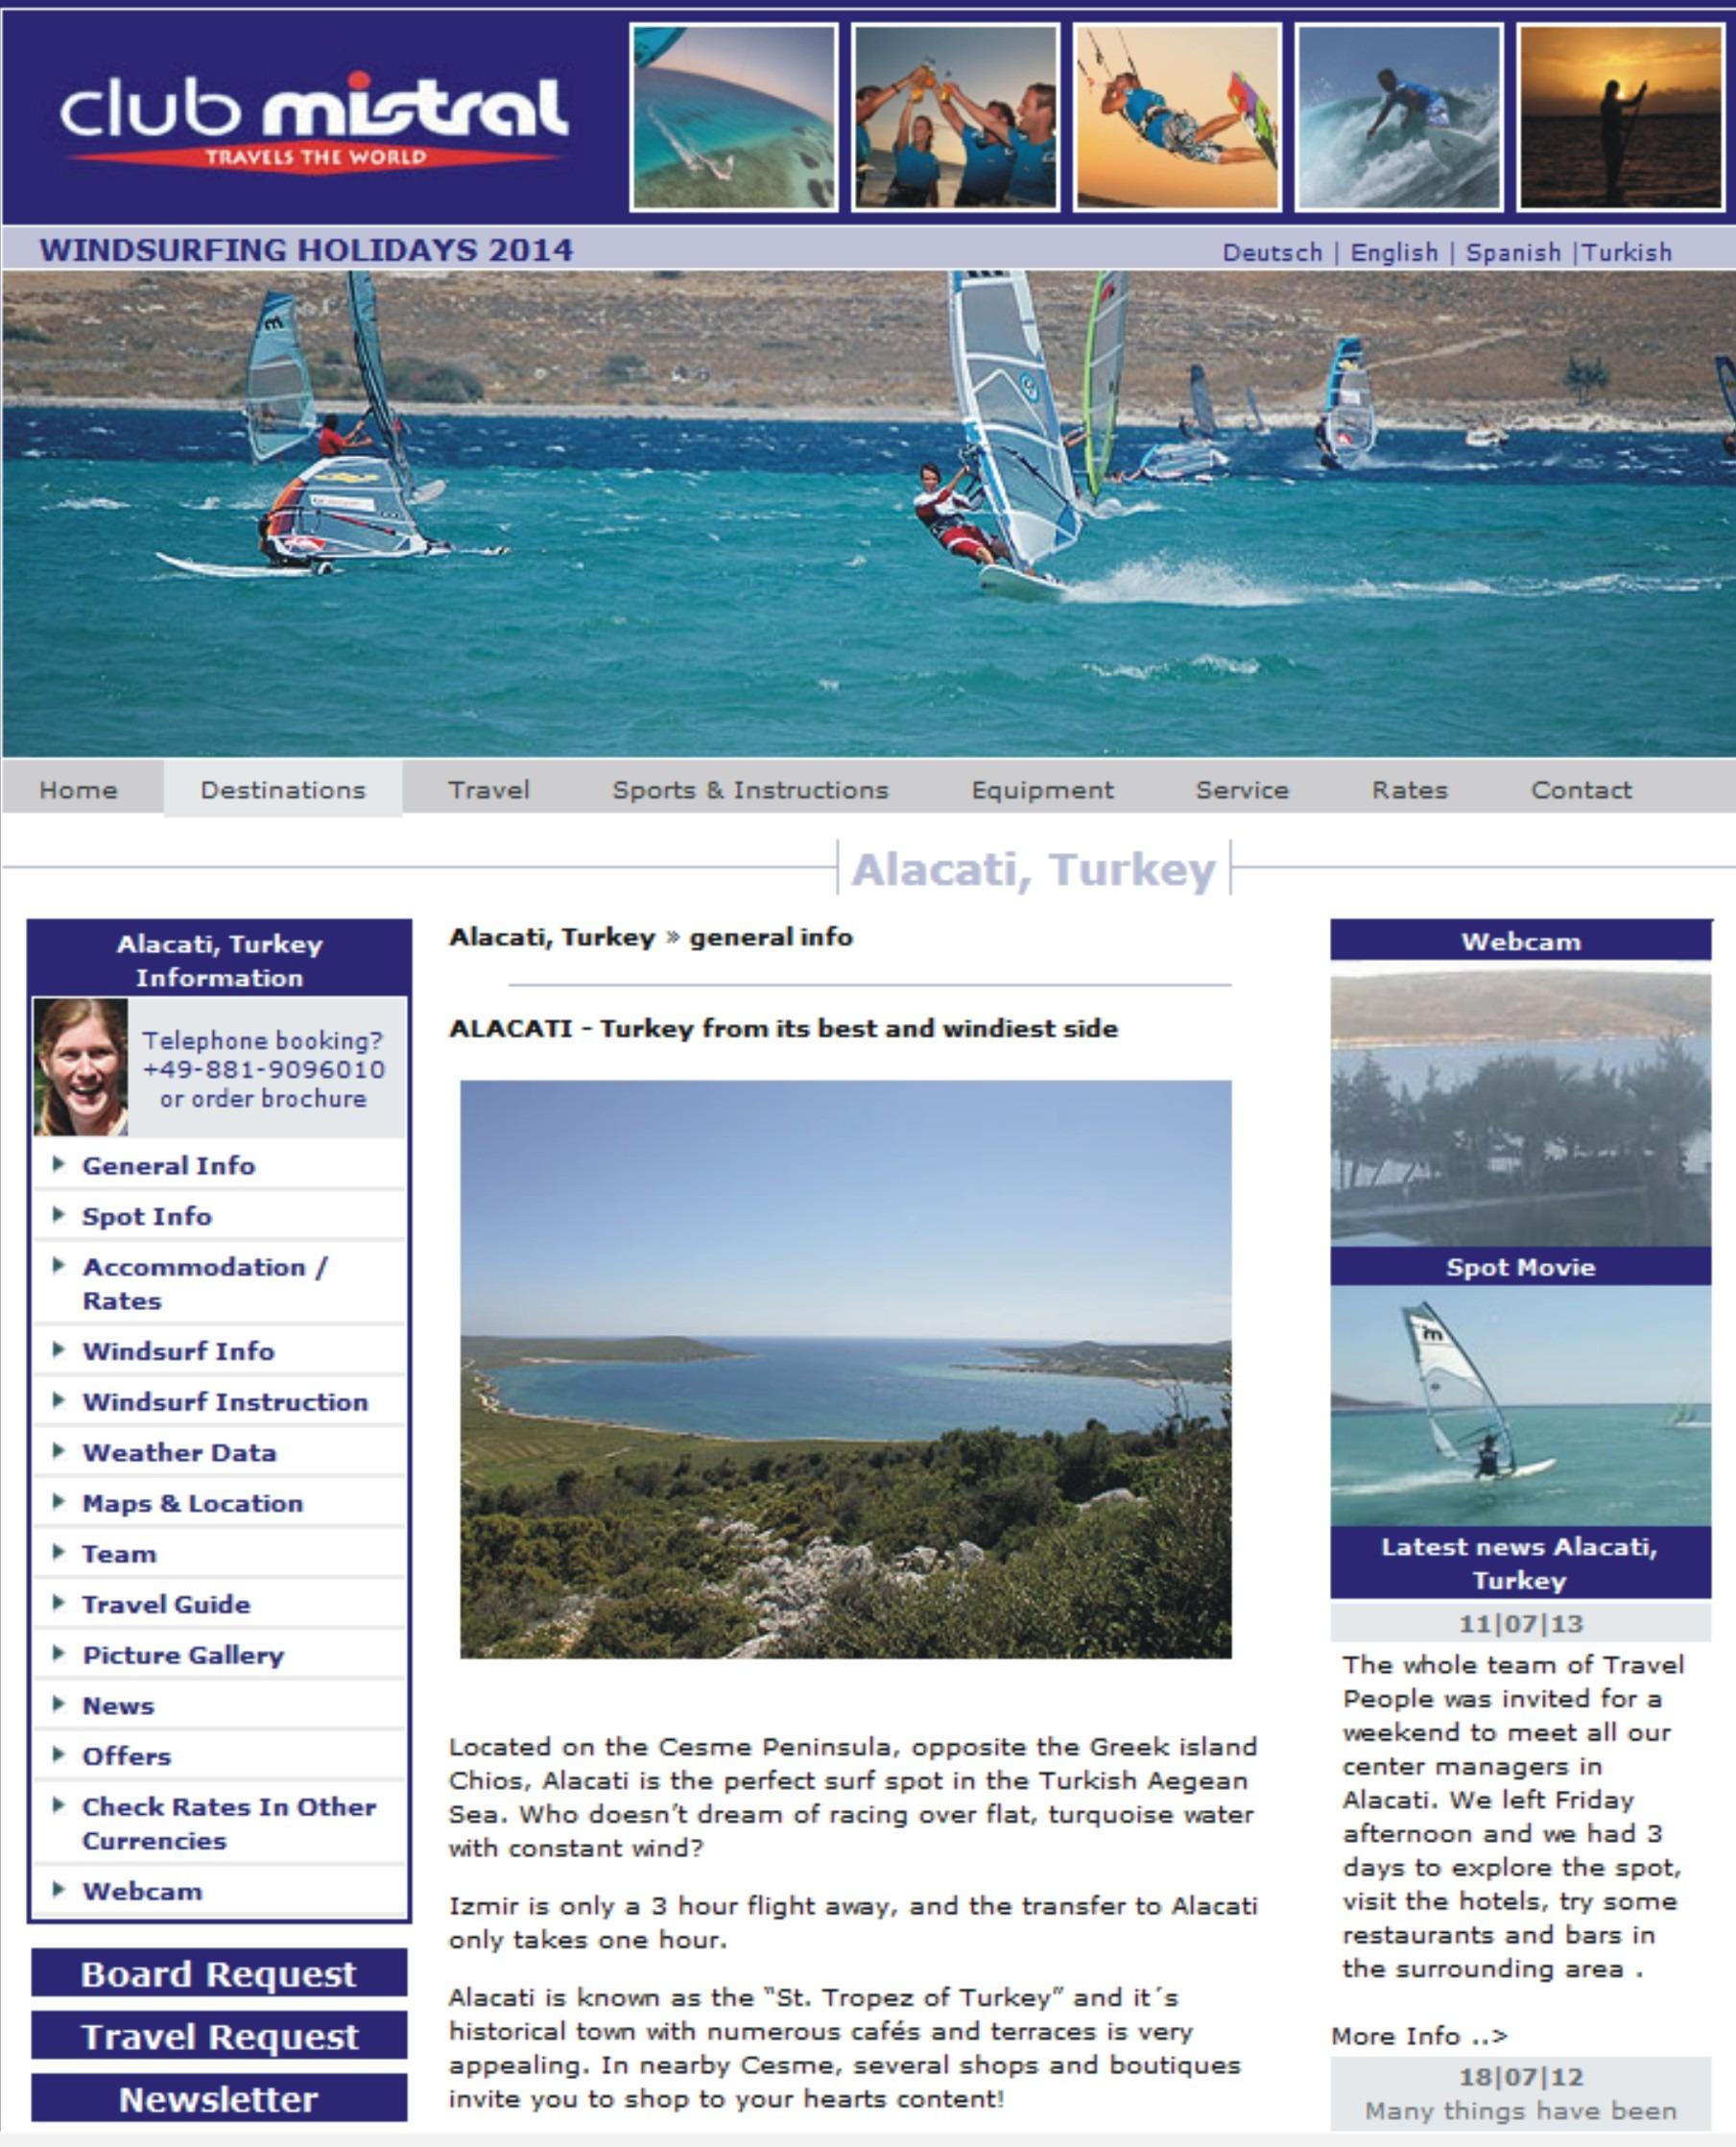 alacati szkoła windsurfing kitesurfing